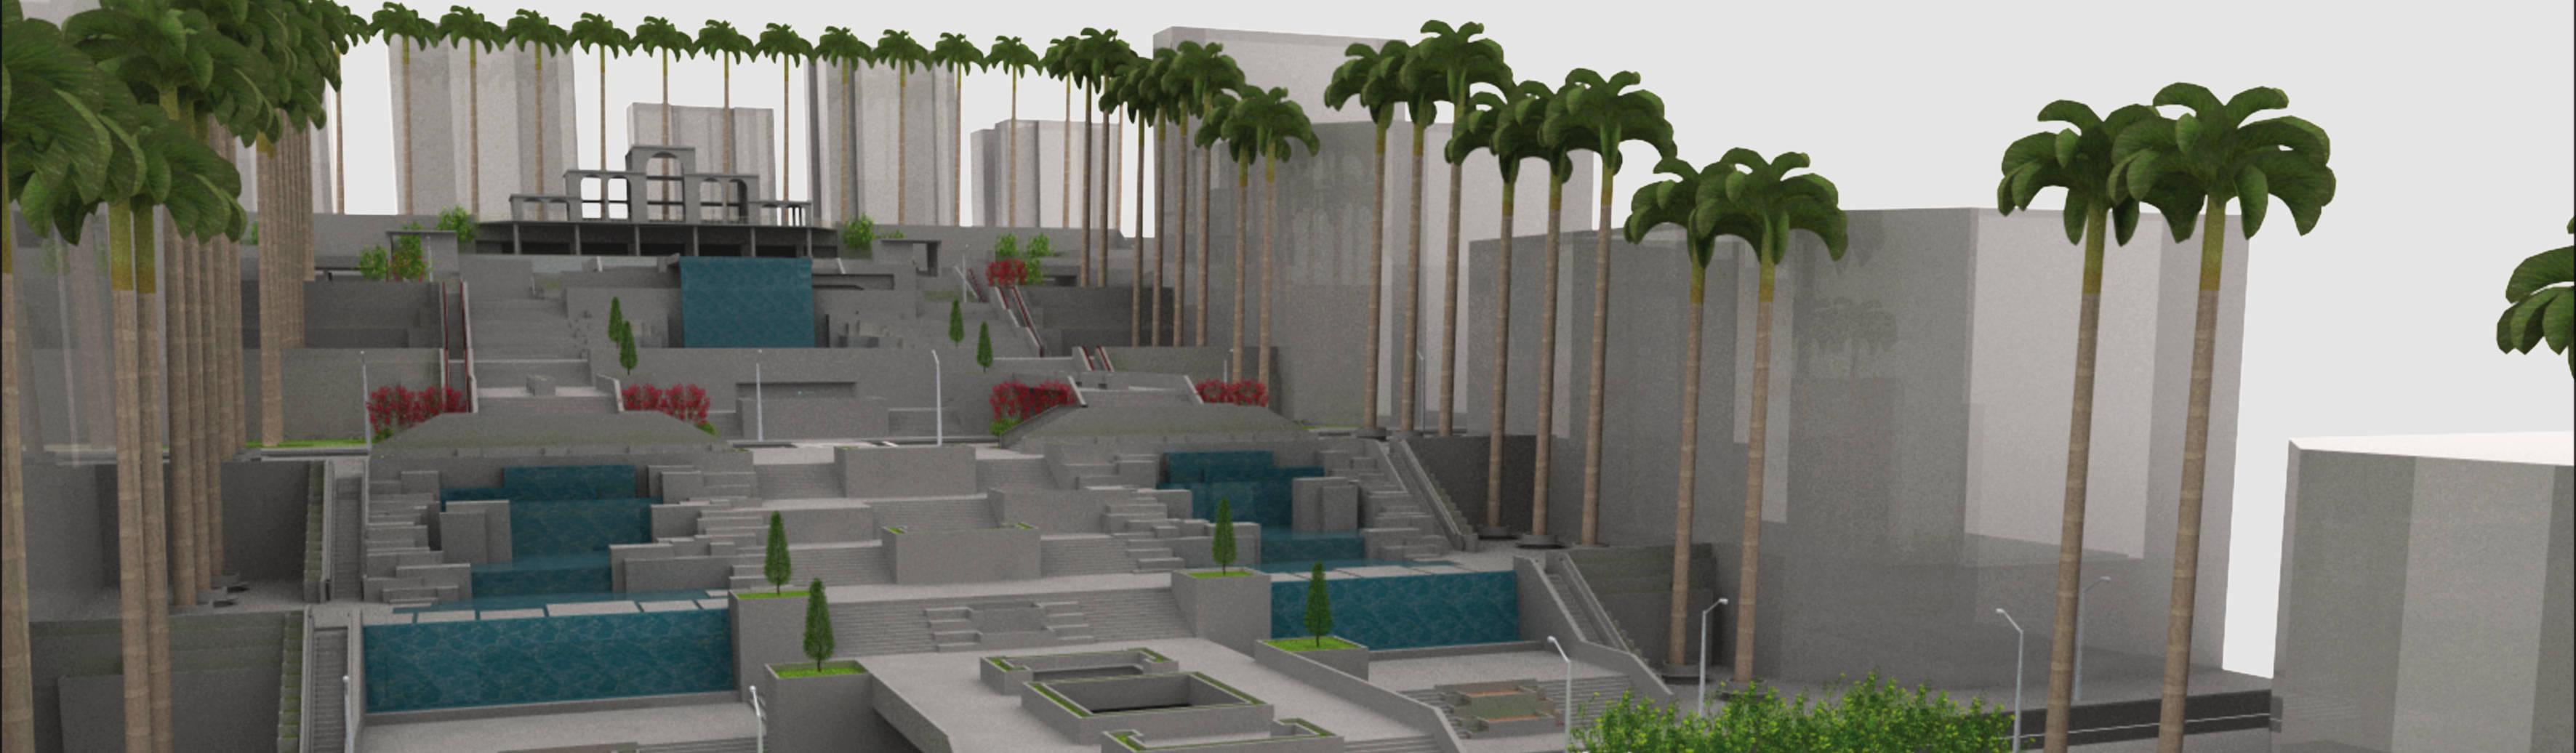 Urbanográfica